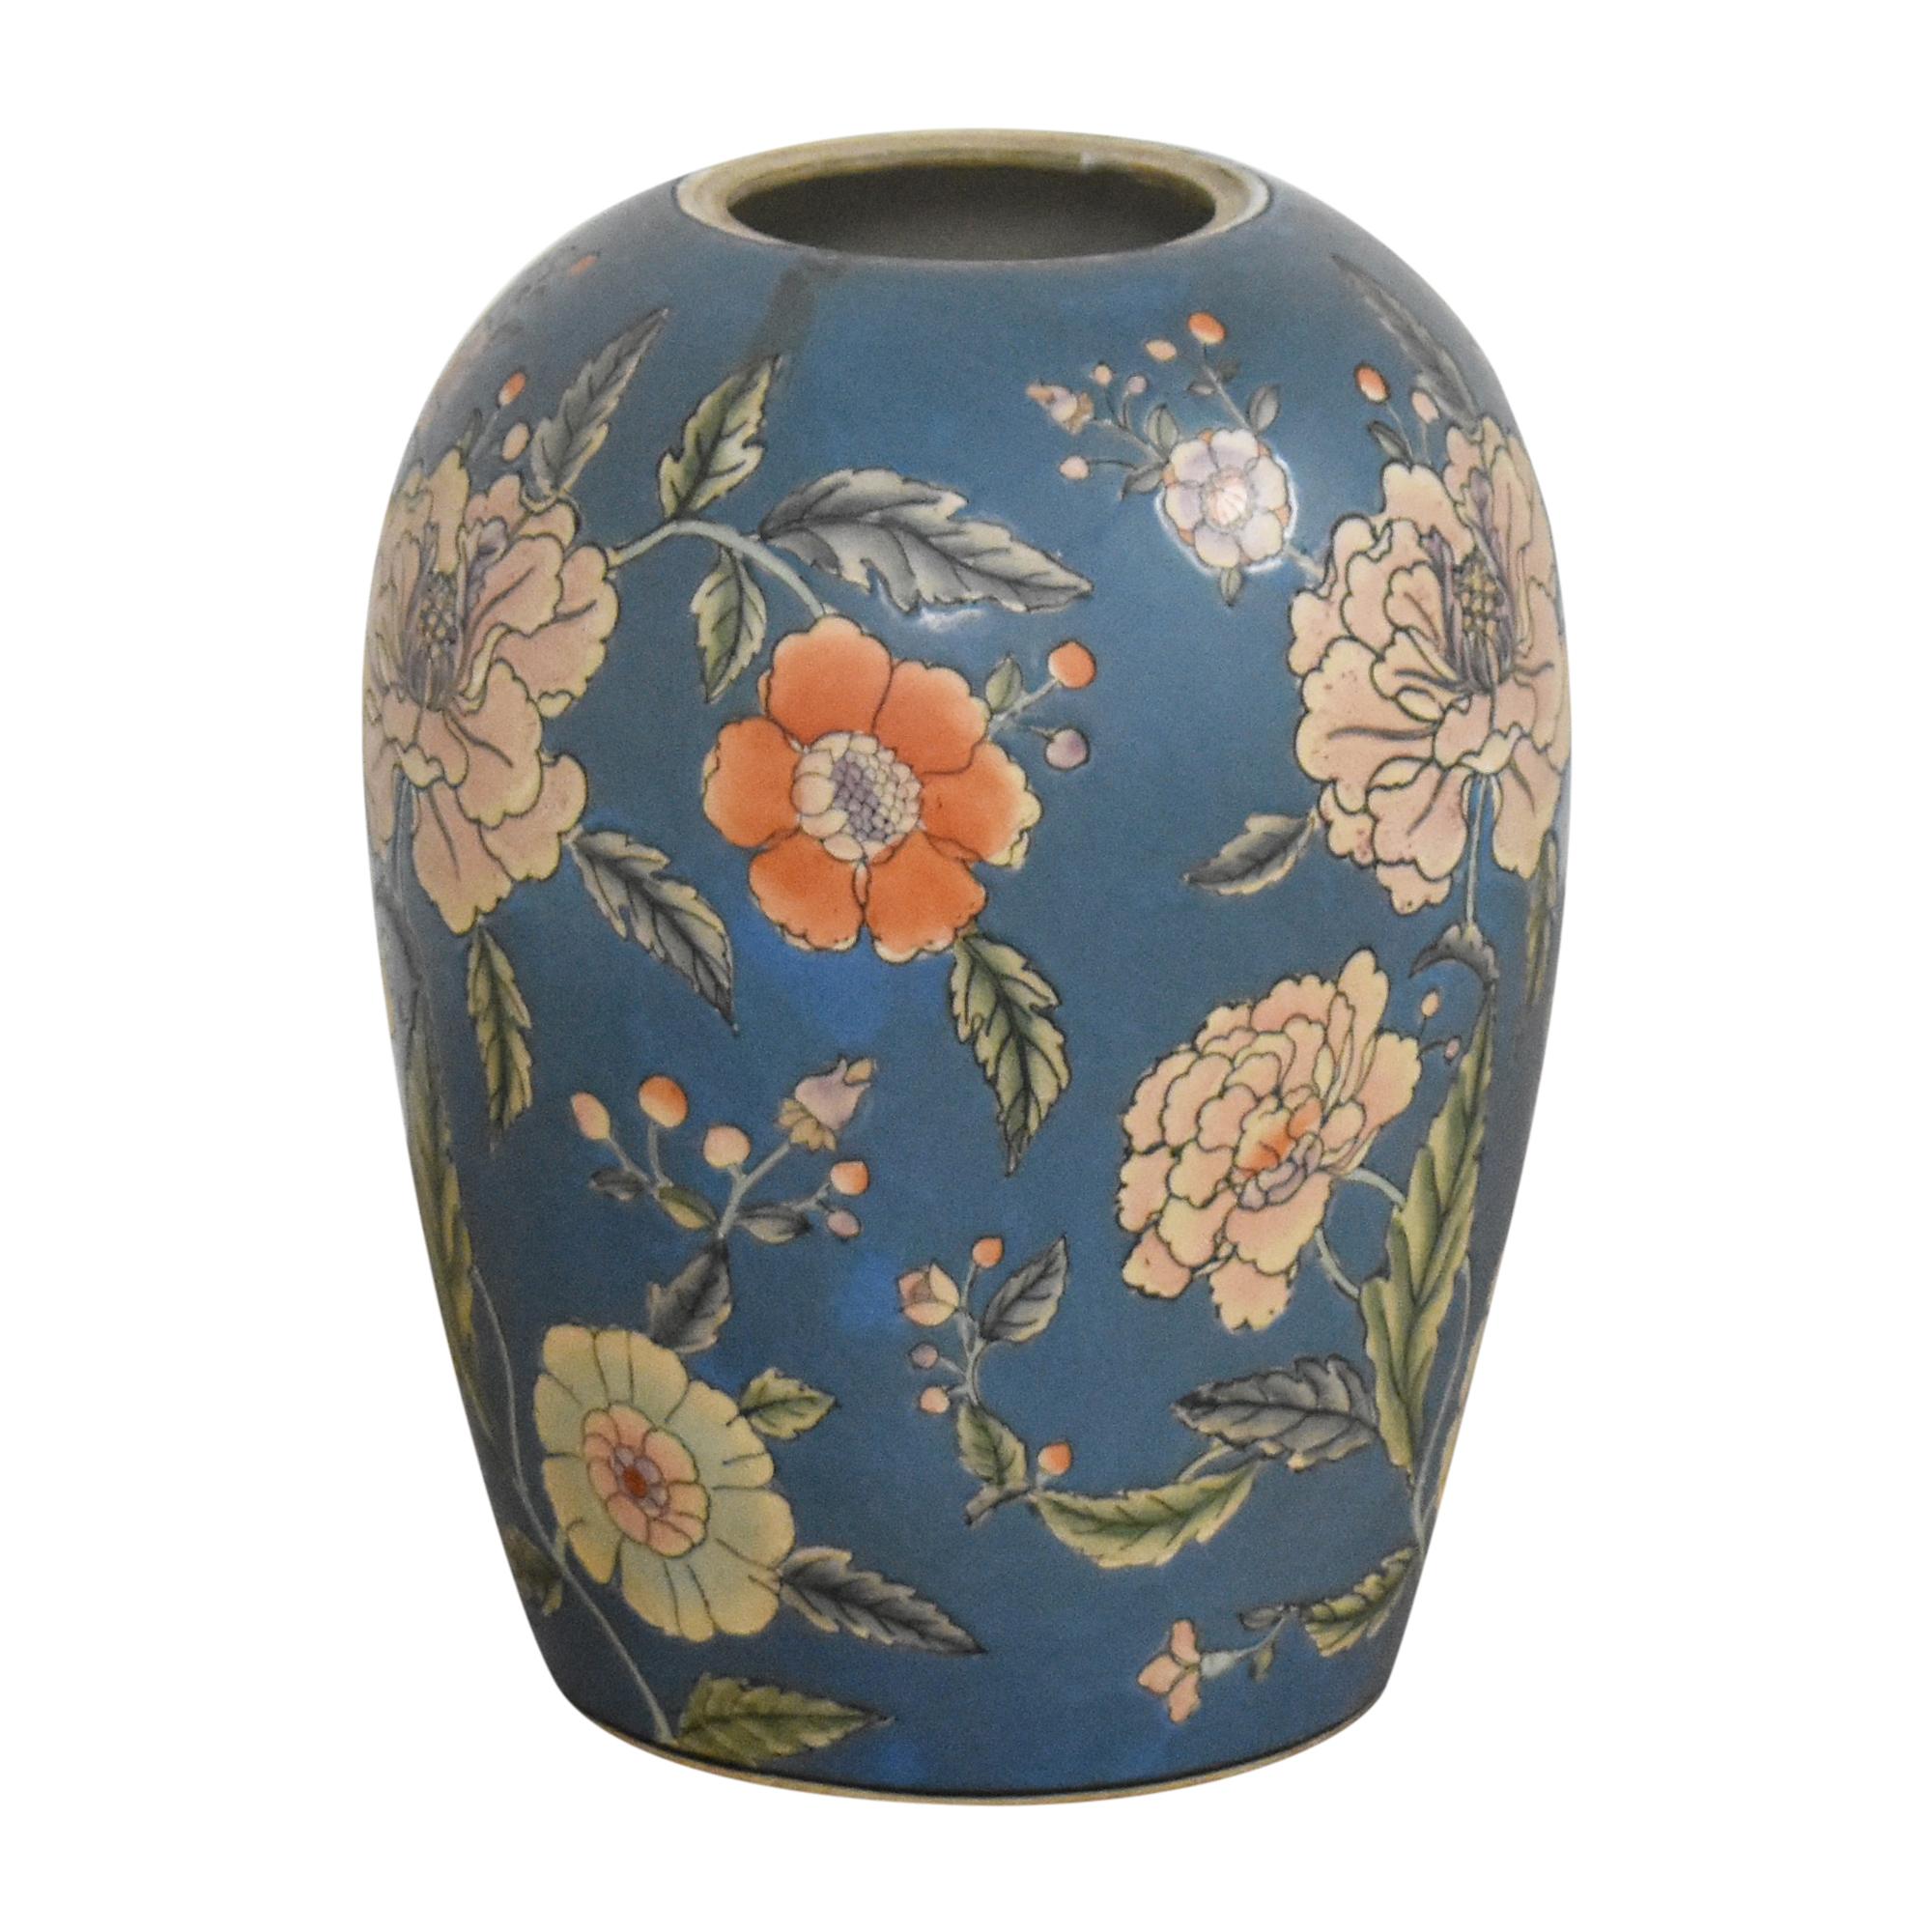 shop Large Decorative Floral Urn  Decor